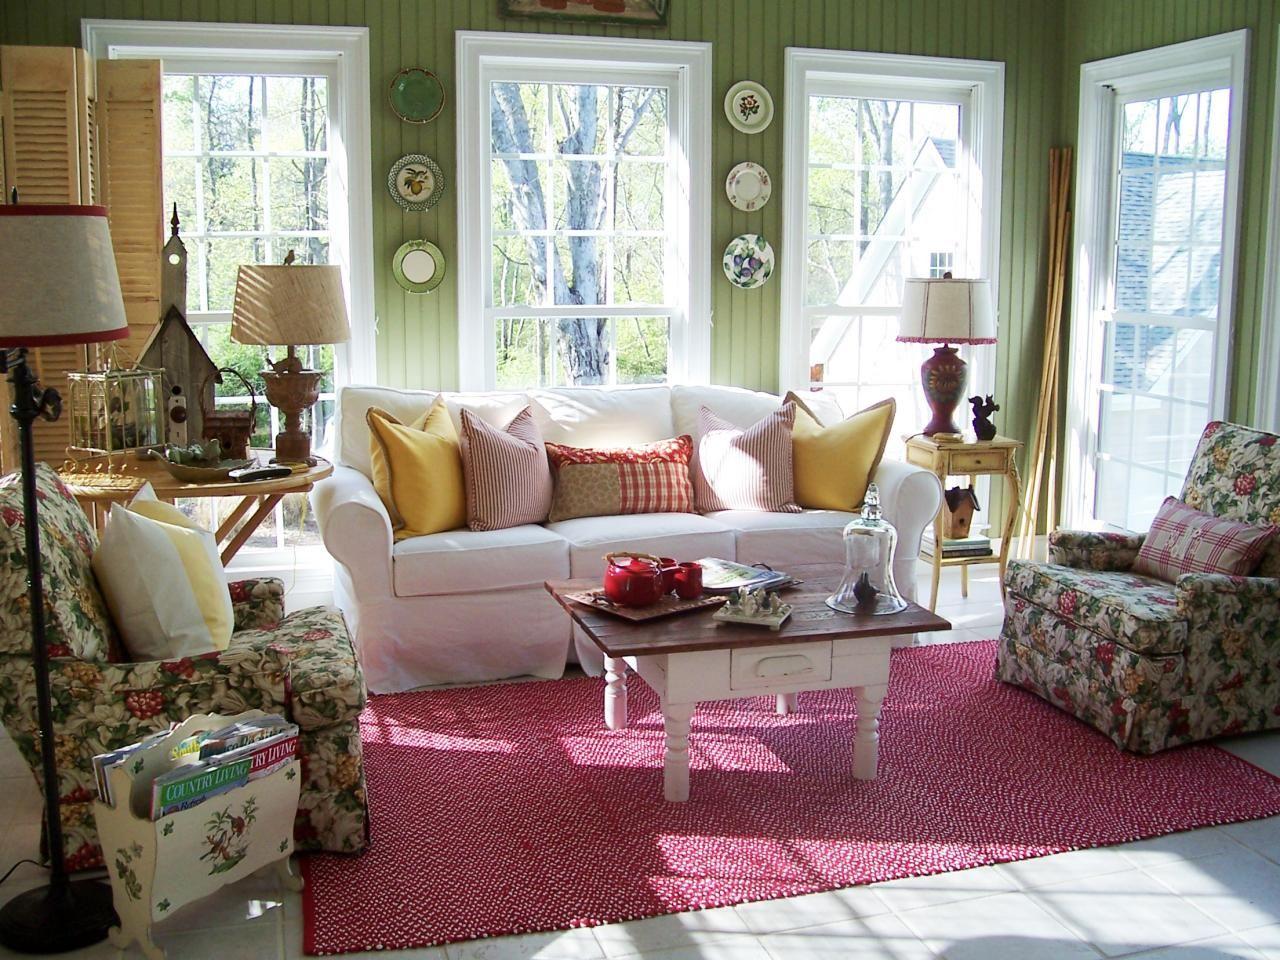 Inspirational Decorating Sunrooms Interior Images